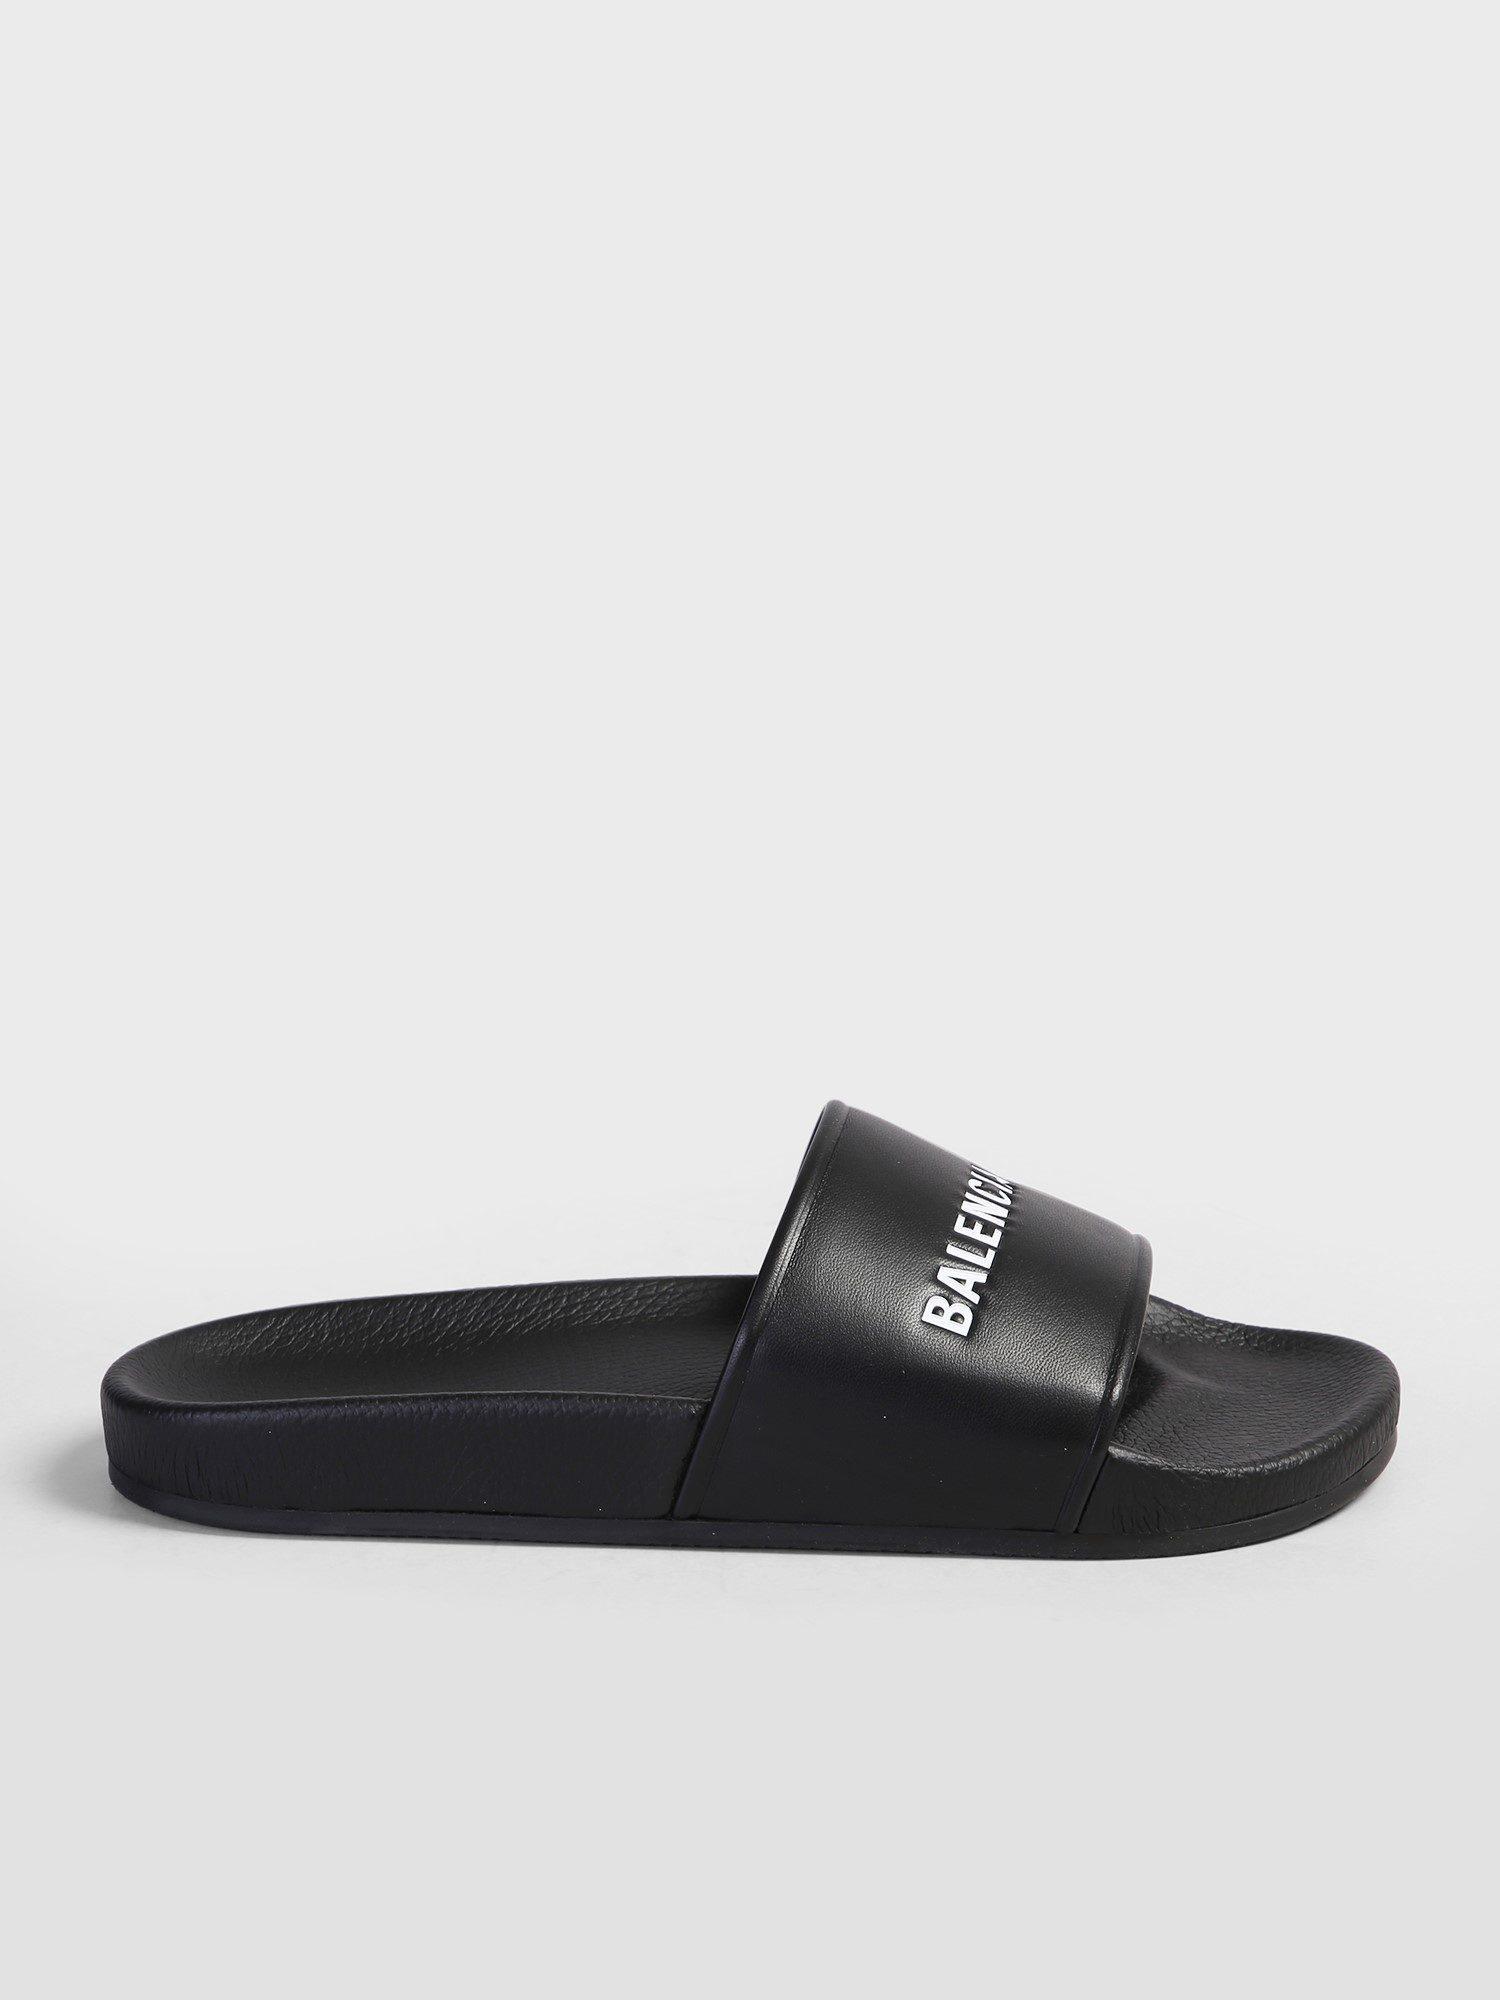 cf48d63ec5647 Balenciaga Logo Print Slide Sandals in Black for Men - Lyst